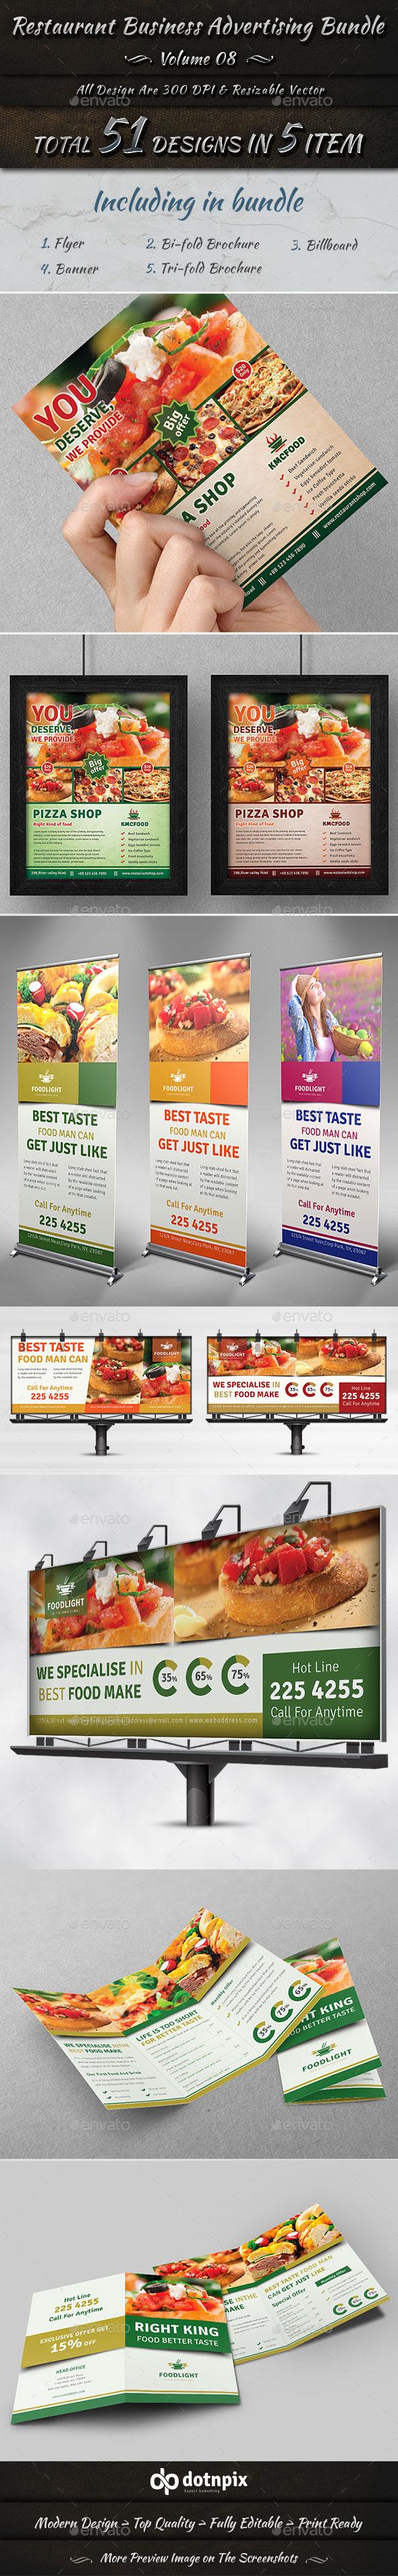 Restaurant Business Advertising Bundle   Volume 8 - Stationery Print Templates